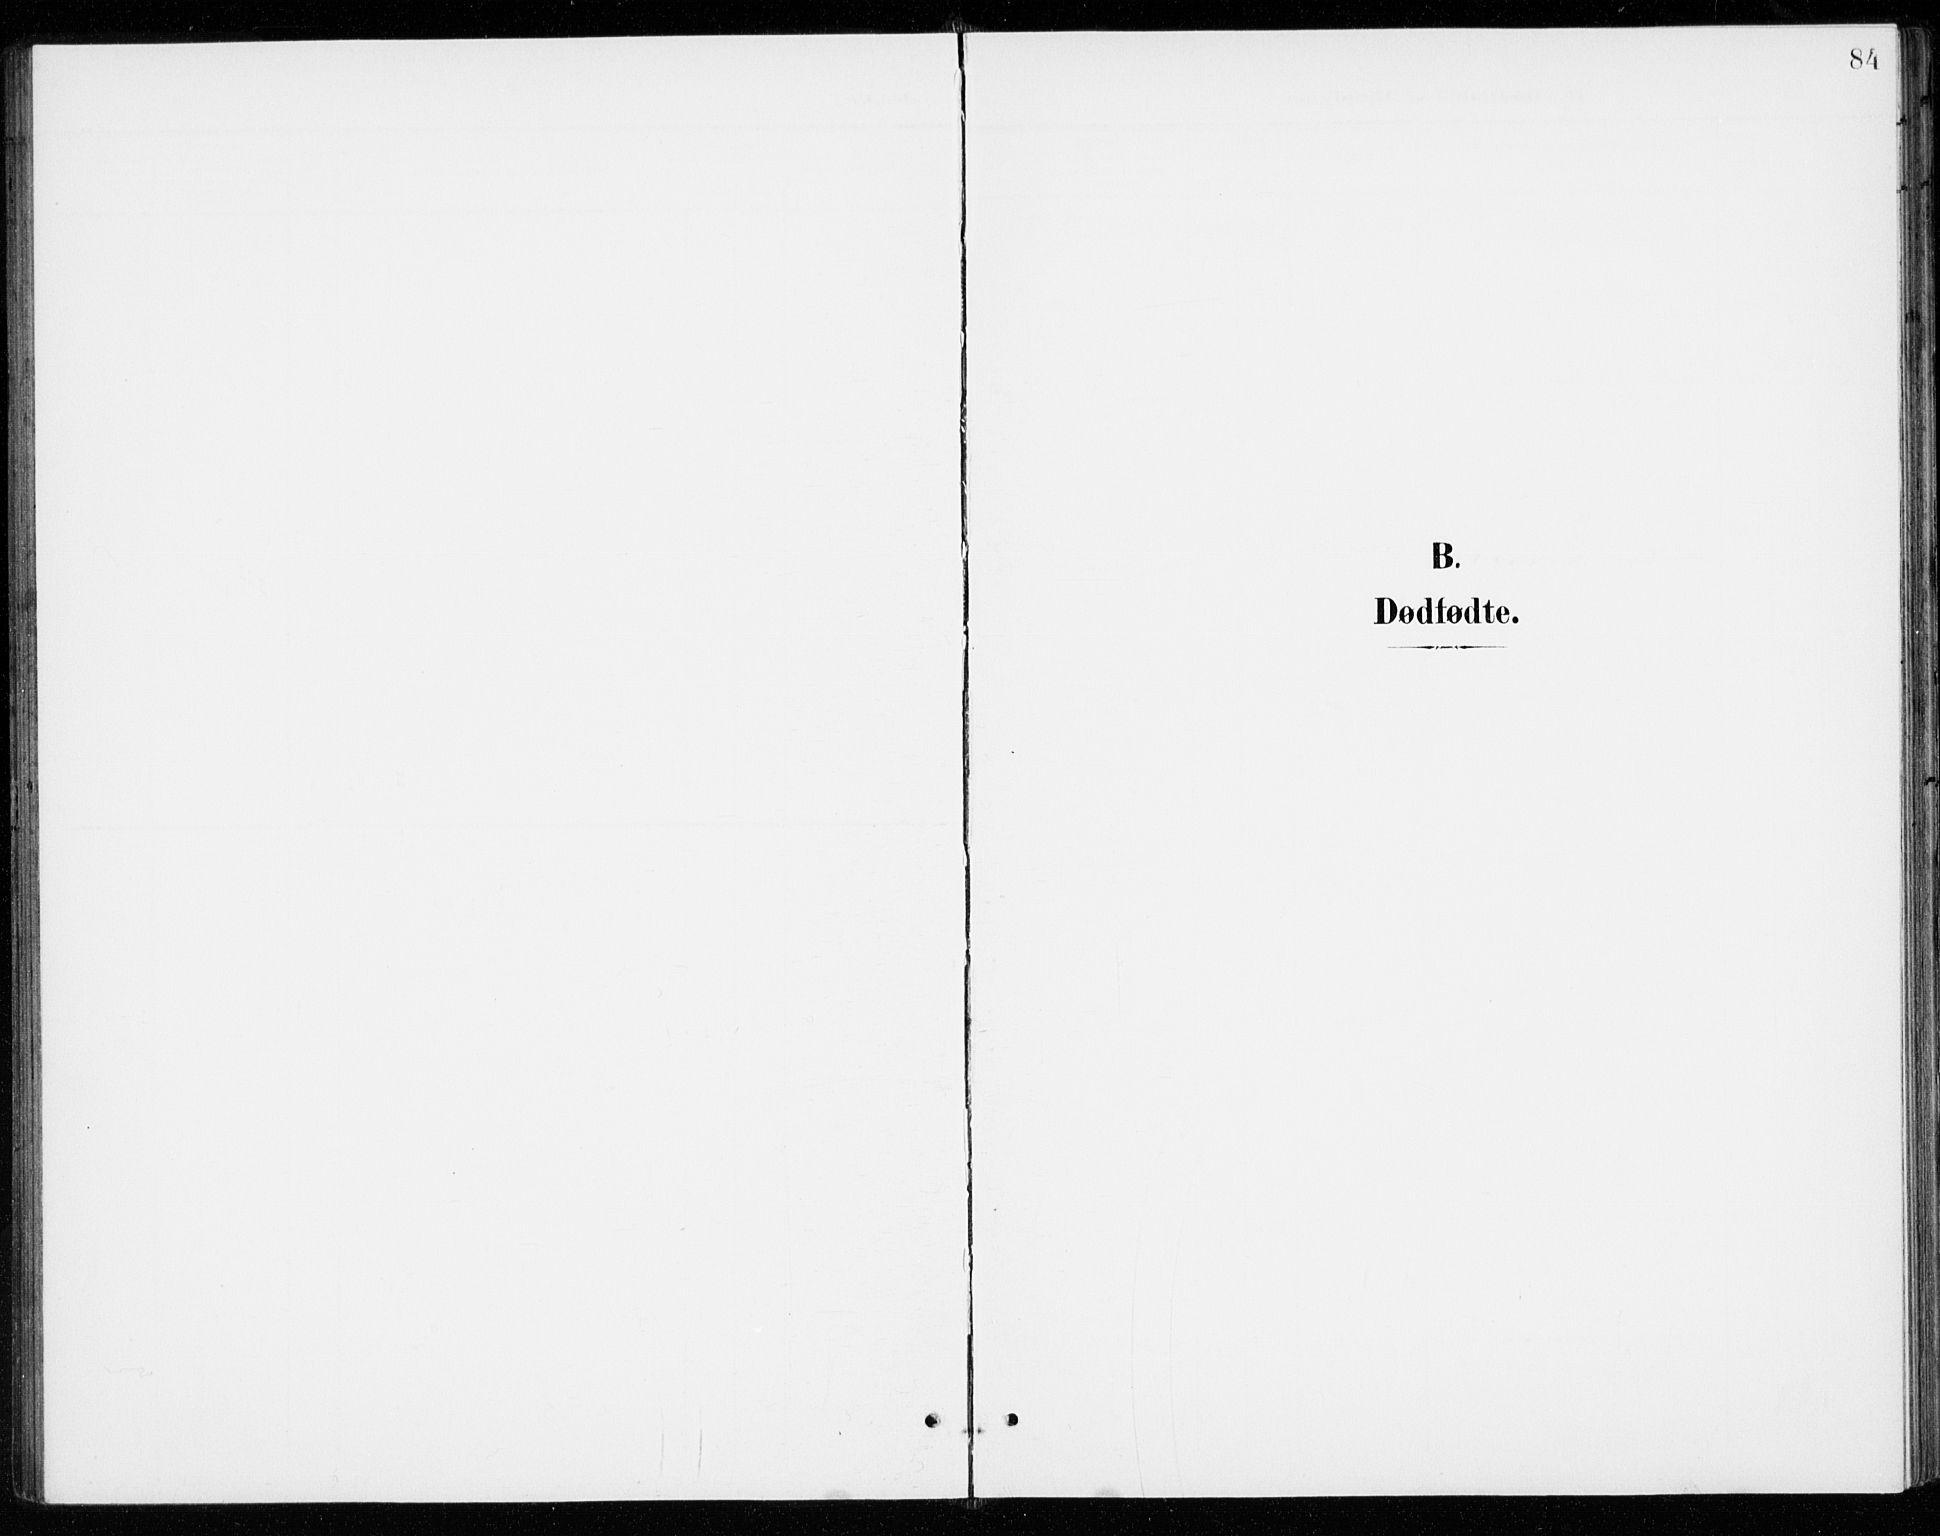 SAO, Gjerdrum prestekontor Kirkebøker, G/Gb/L0001: Klokkerbok nr. II 1, 1901-1944, s. 84